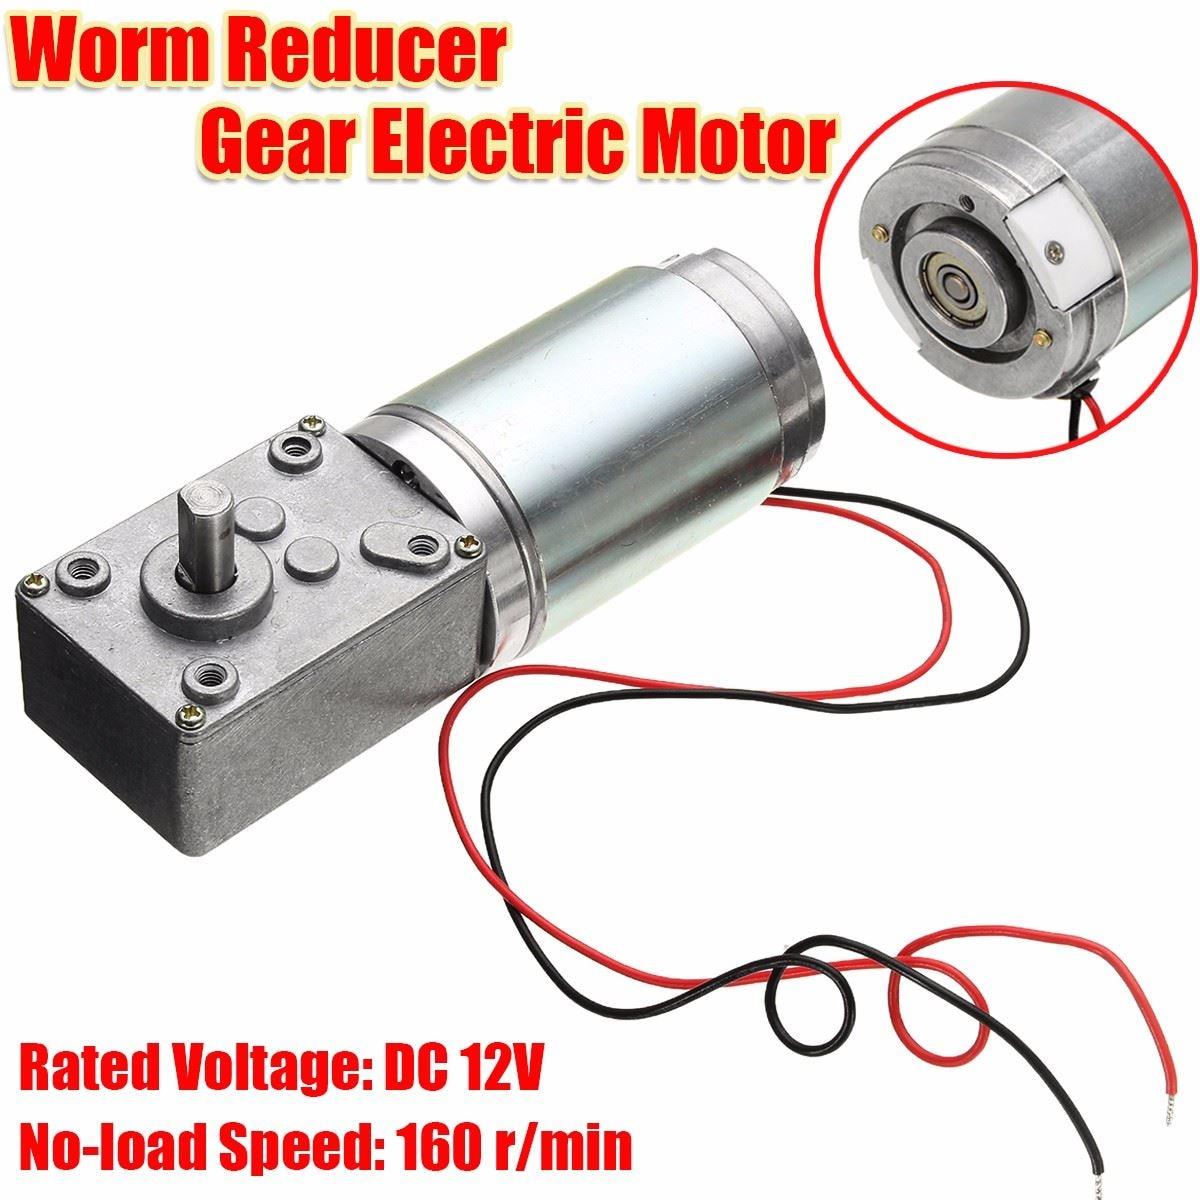 1PCS DC12V 160rpm Worm Reducer Gear Electric Motor High Torque W/Reduction 10 kg.cm Small Volume  цены